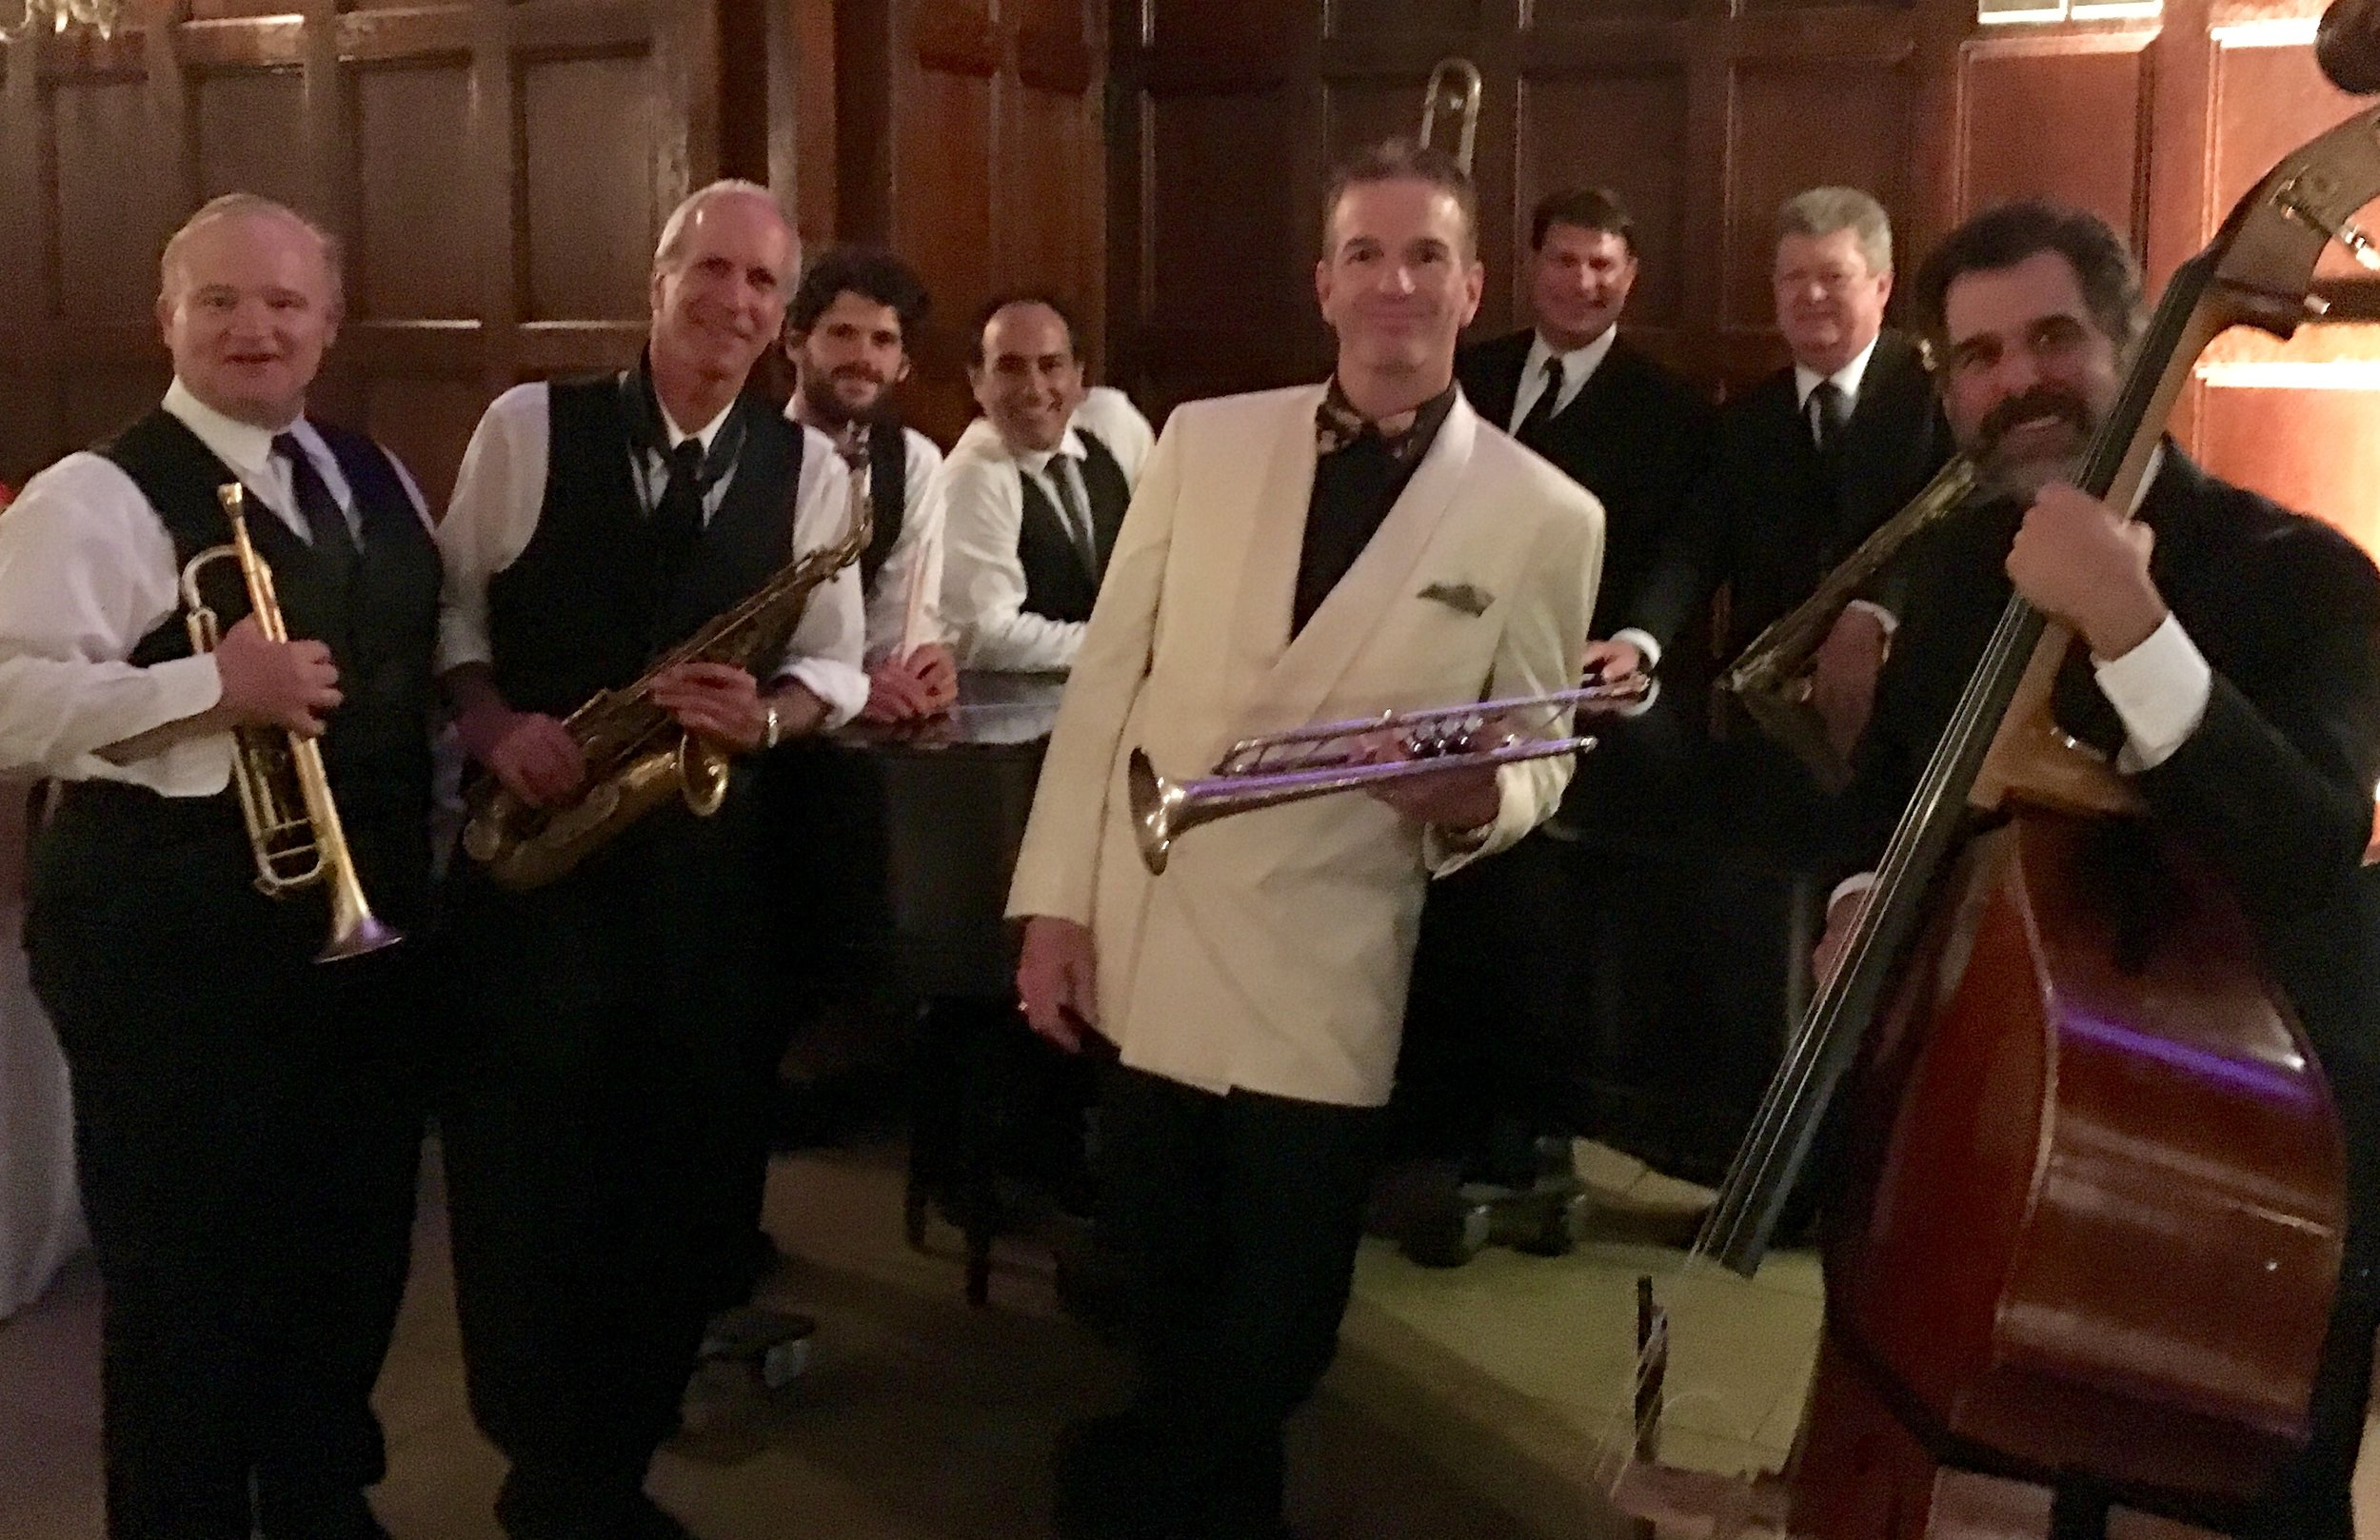 Mark Greel & Swing-Time performing big band swing all around Boston